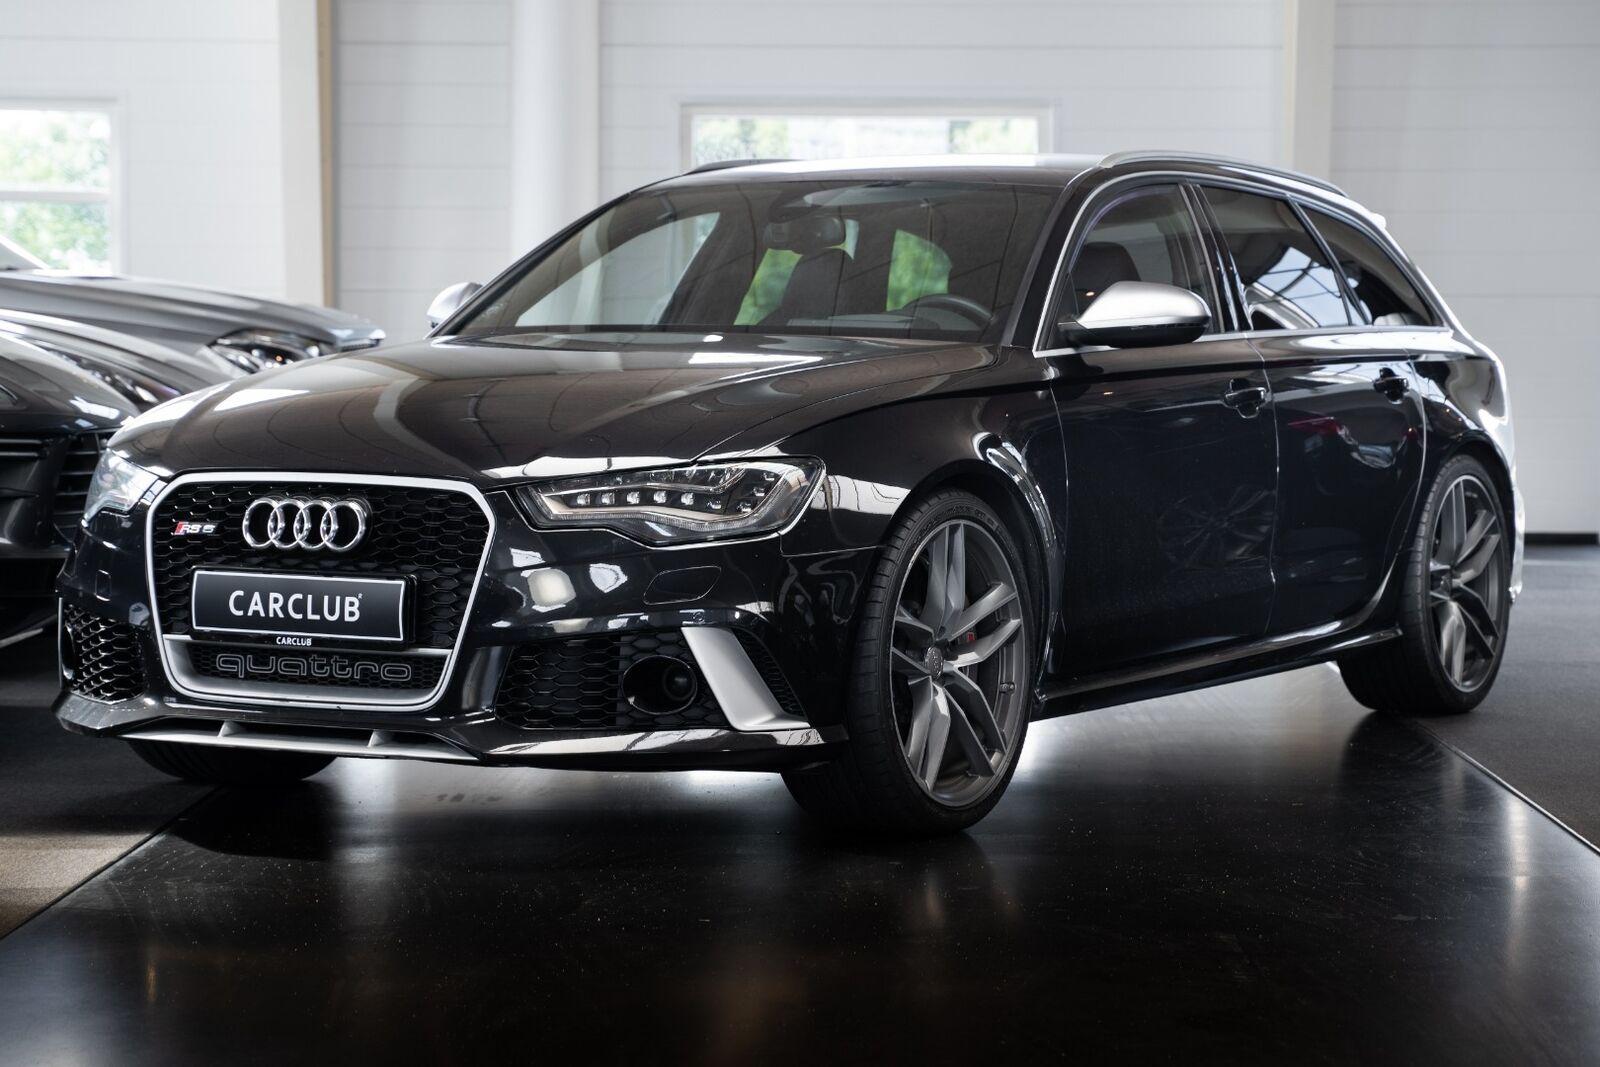 Audi RS6 4,0 TFSi Avant quattro Tiptr. 5d - 5.394 kr.